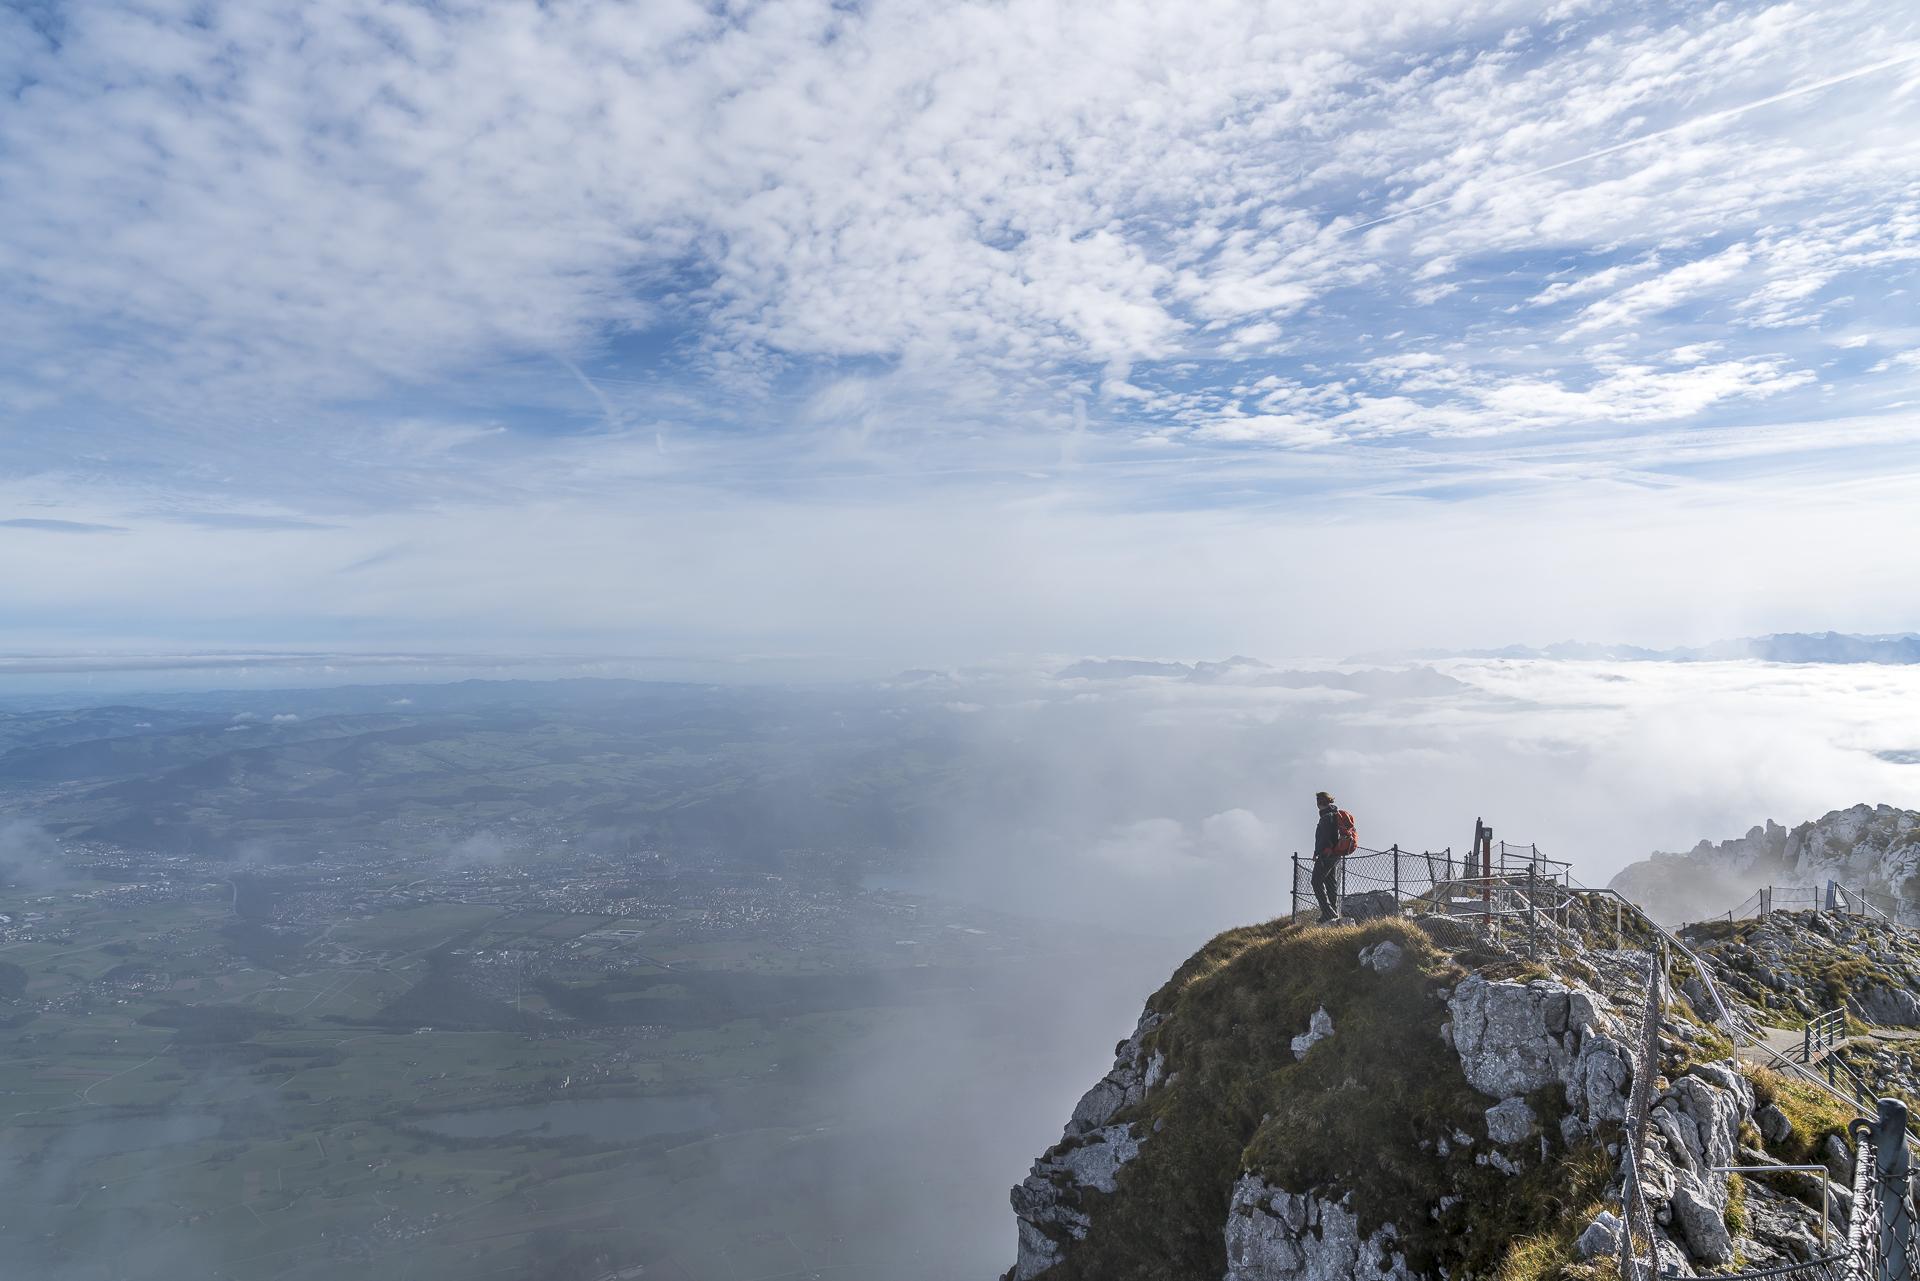 Stockhorn Gipfel